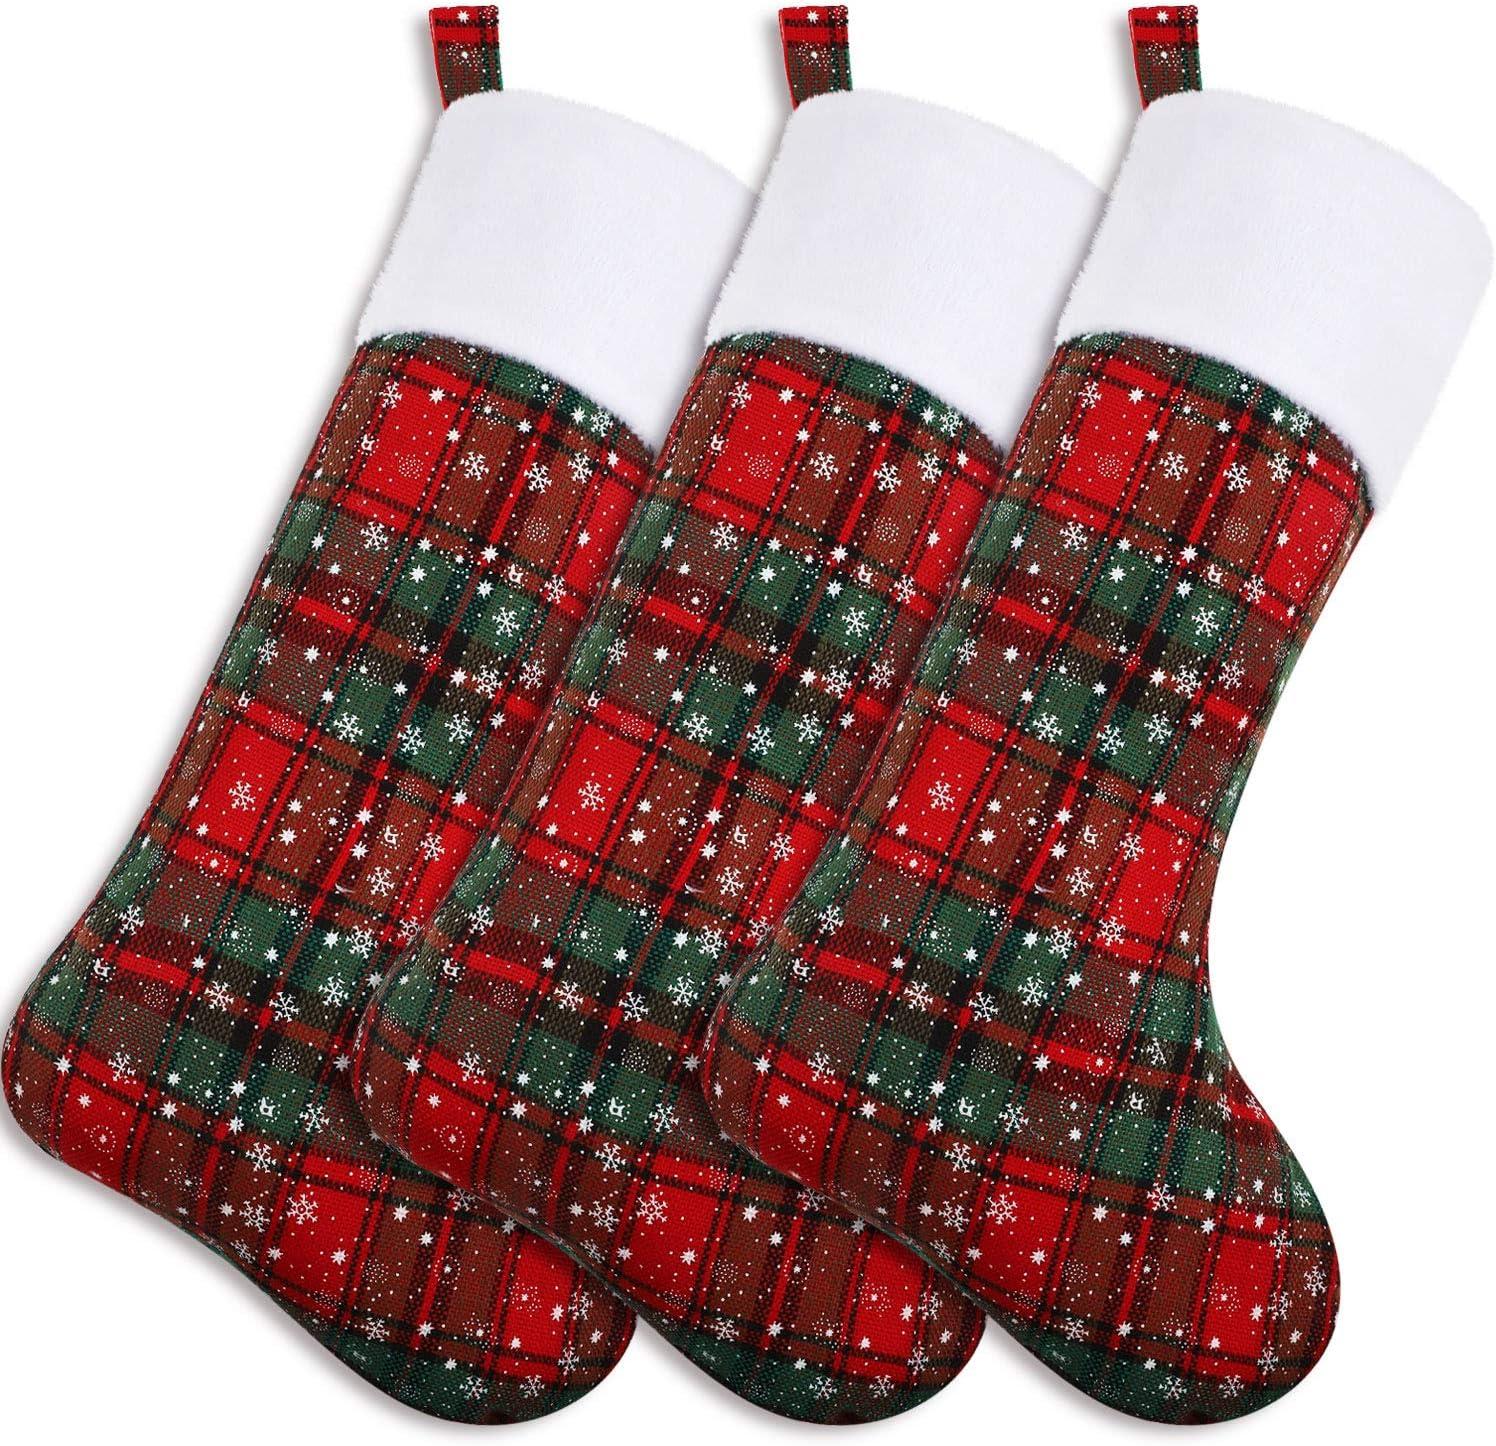 Syhood quality assurance Christmas Stockings Xmas Decoration Fireplace Stocking Ha Cash special price